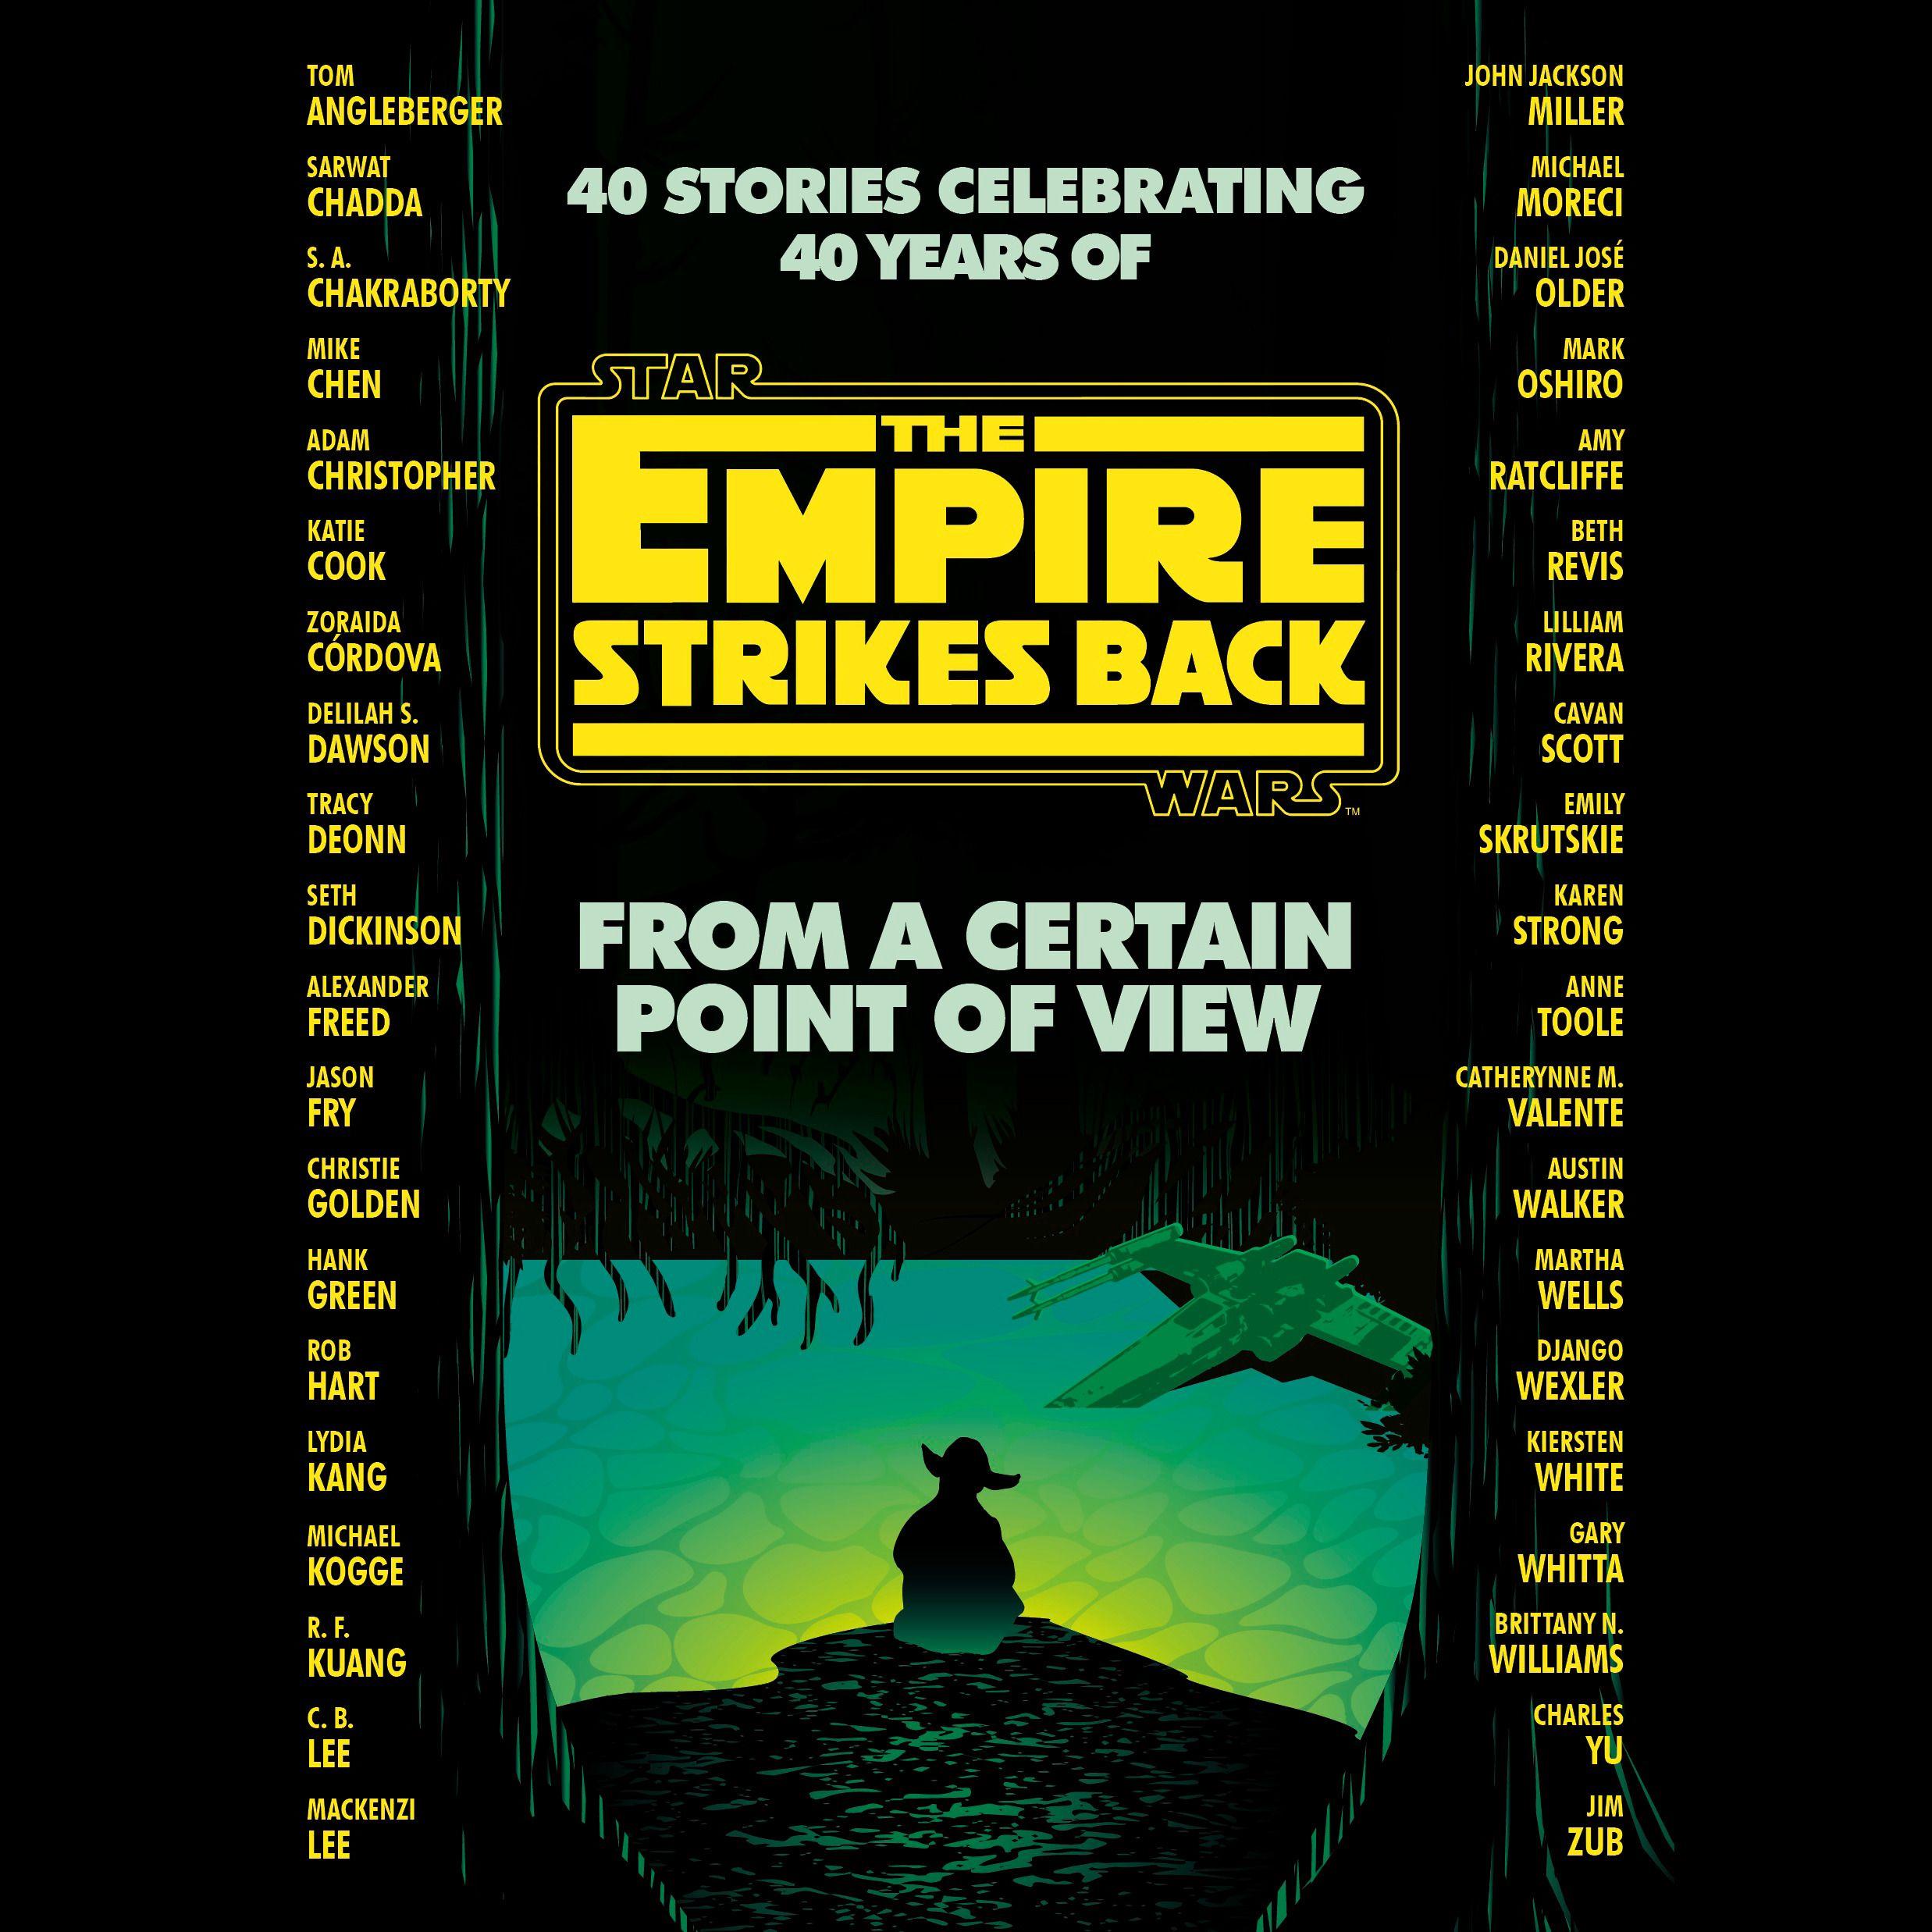 210 Cwk Reviews Ideas In 2021 Star Wars War Star Wars Books